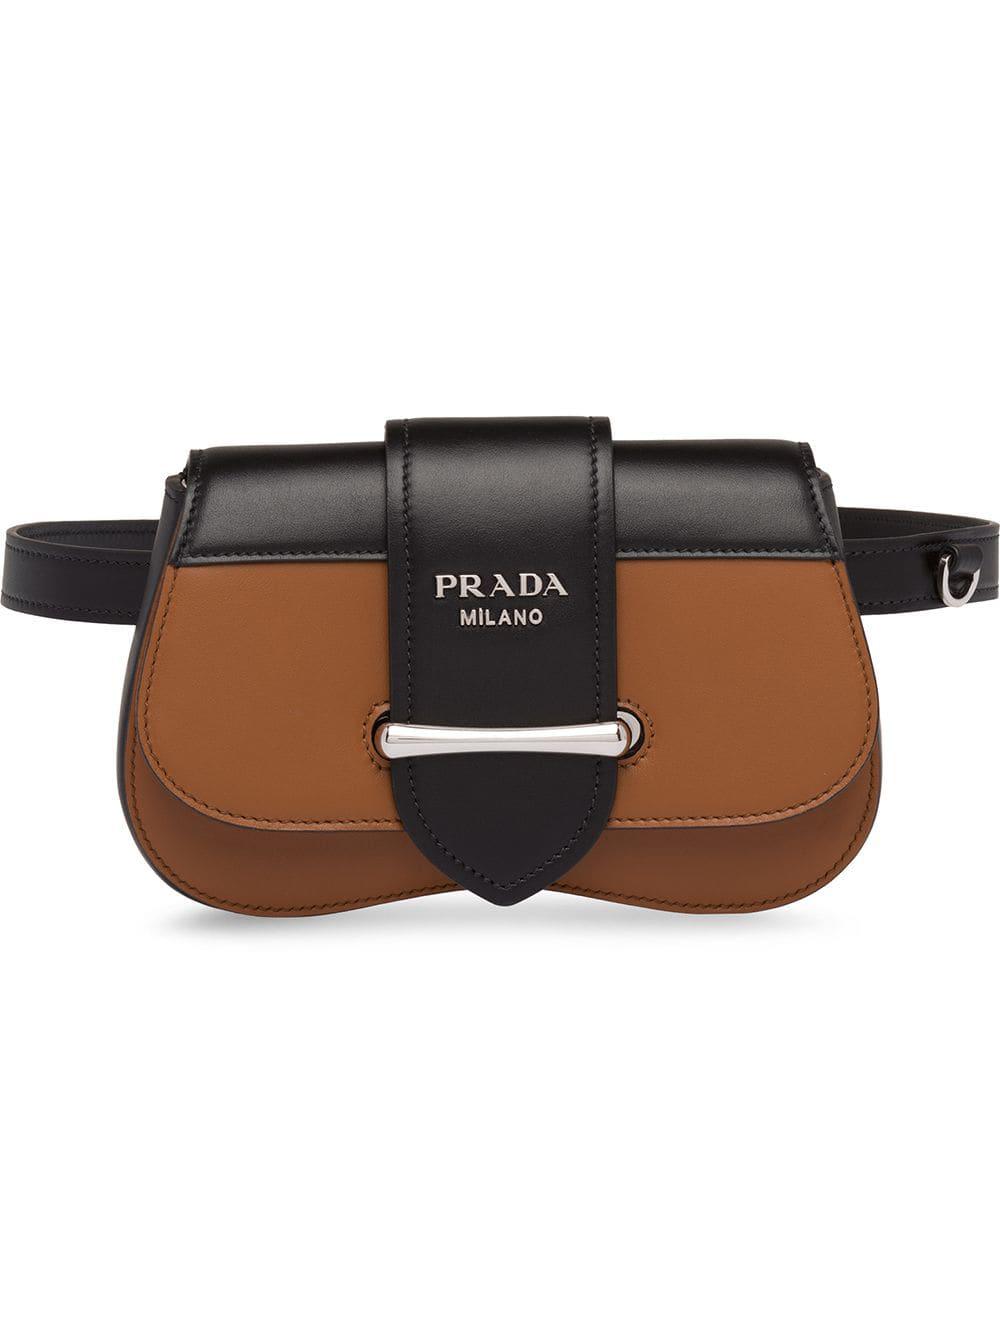 5bdf74c49bf94 Prada Sidonie Leather Belt-Bag - Brown